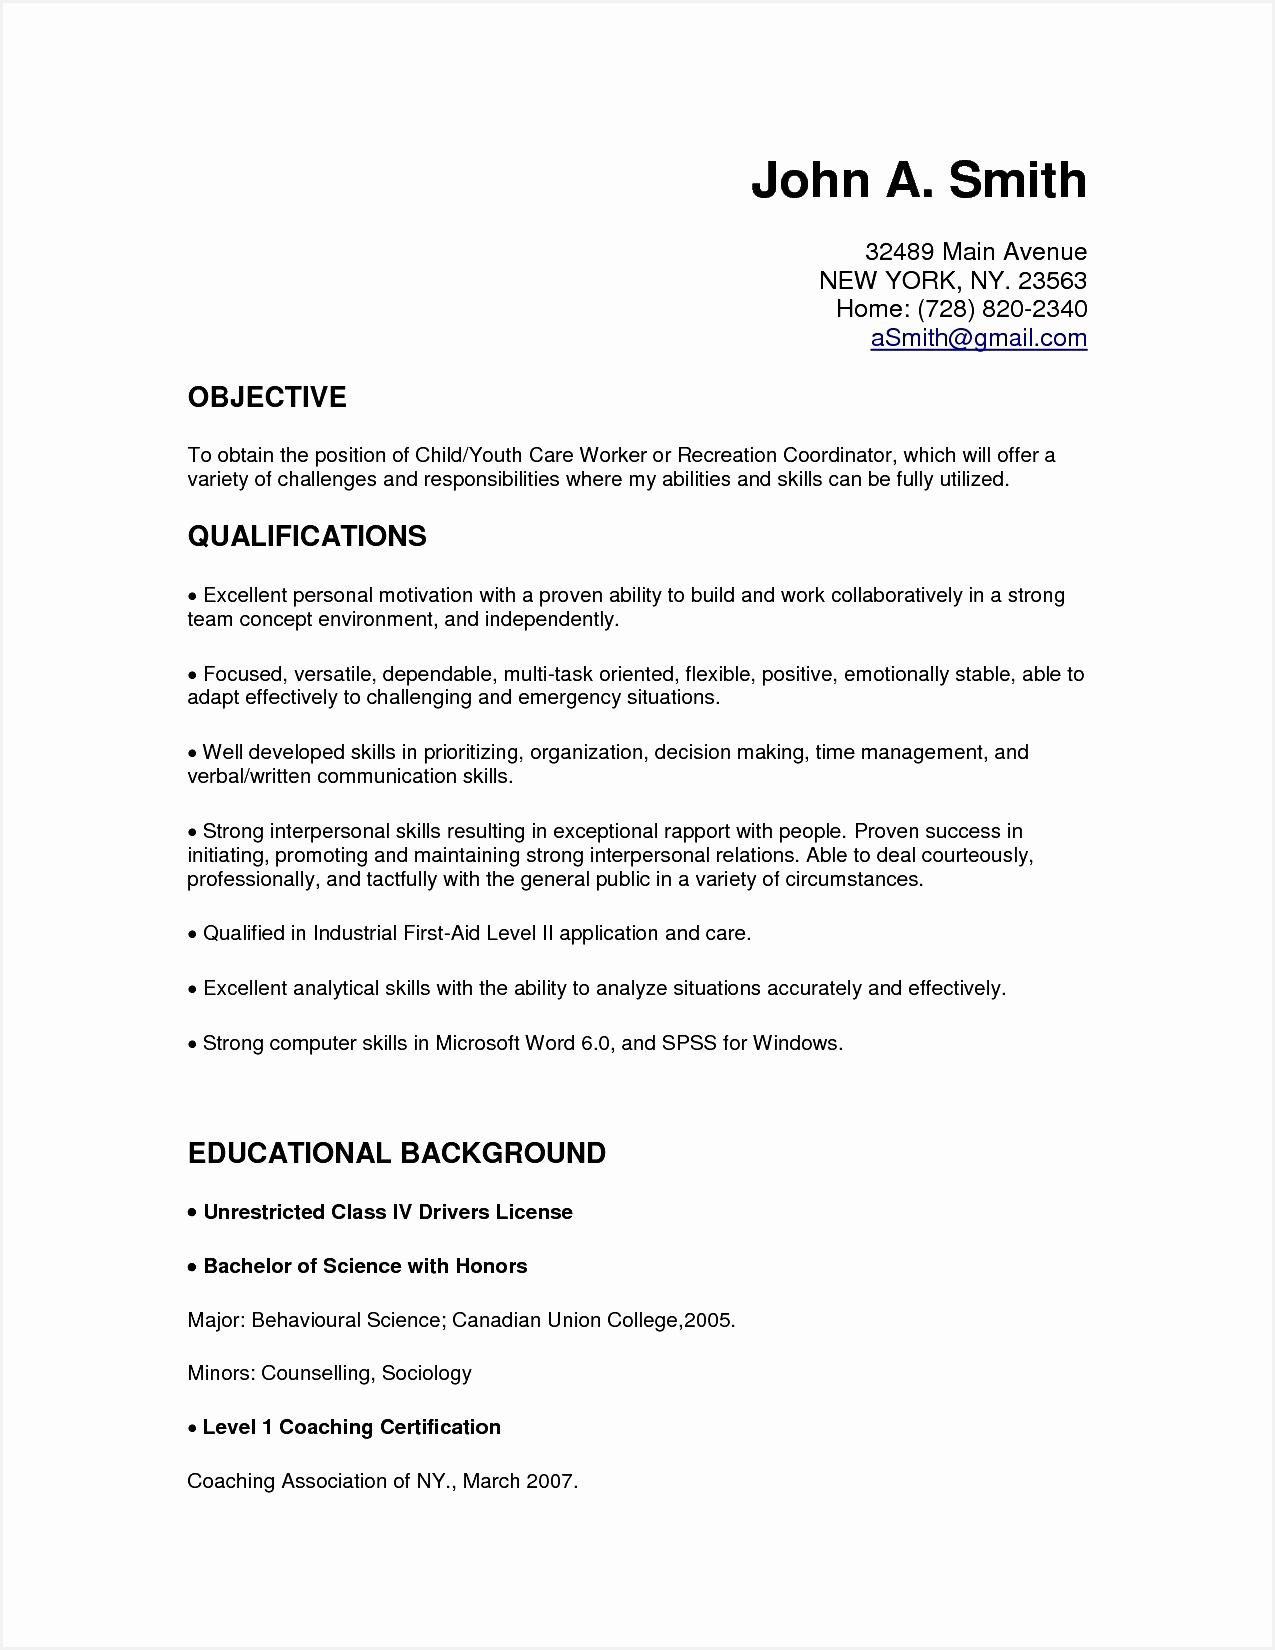 Scientific Resume Template Inspirational Beautiful Make A Resume Basic Resume Template New Ivoice Template 0d16501275